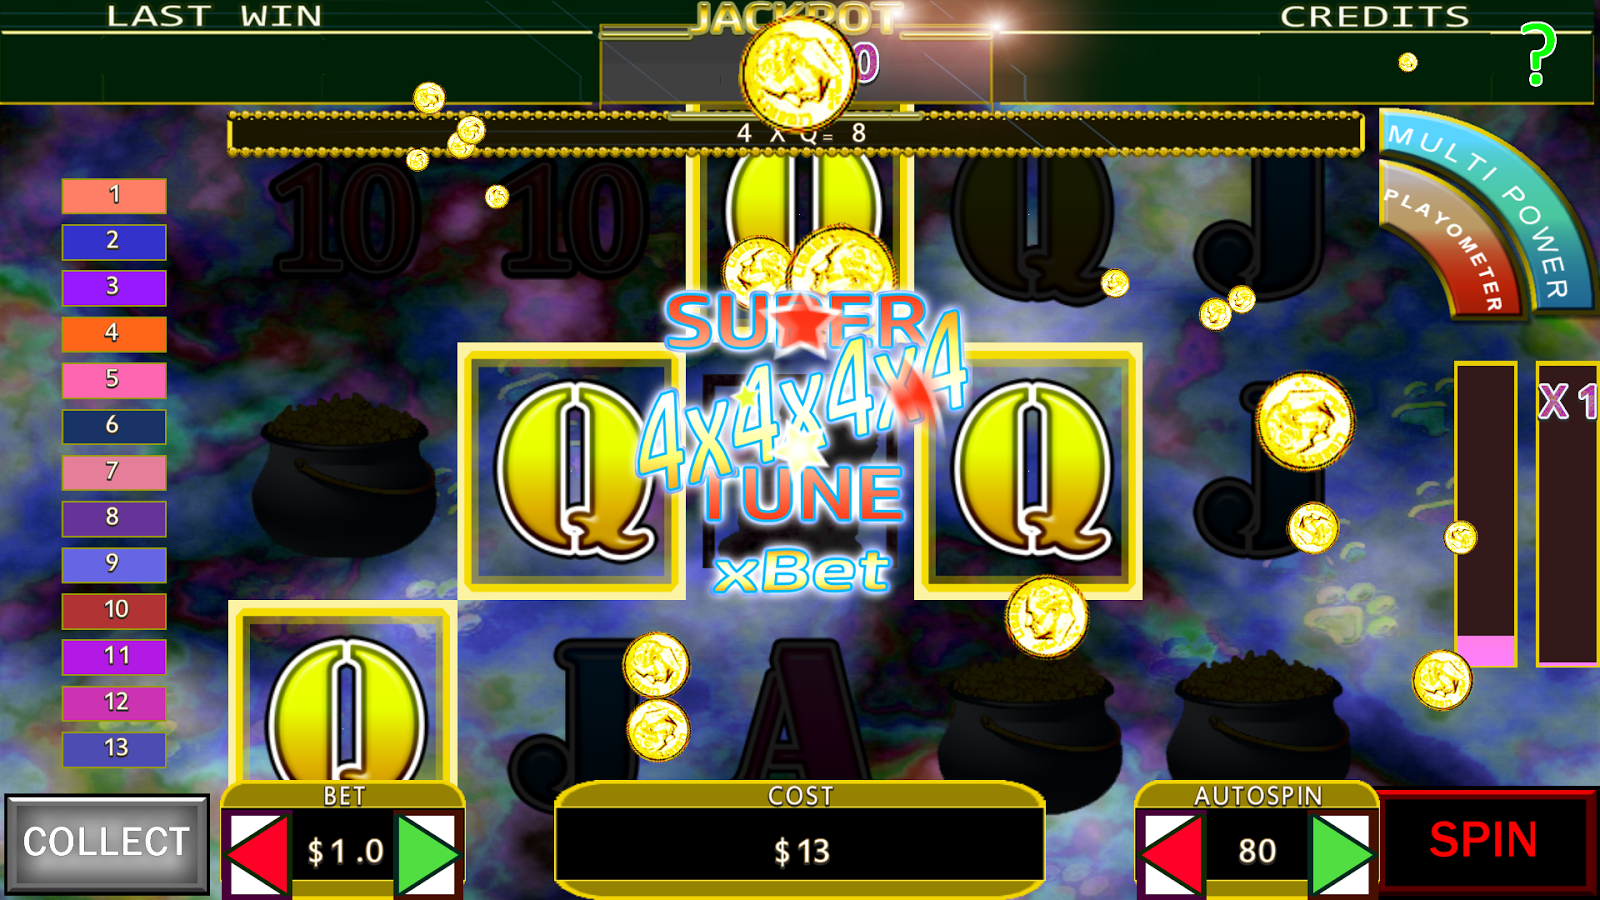 cool catz slot machine